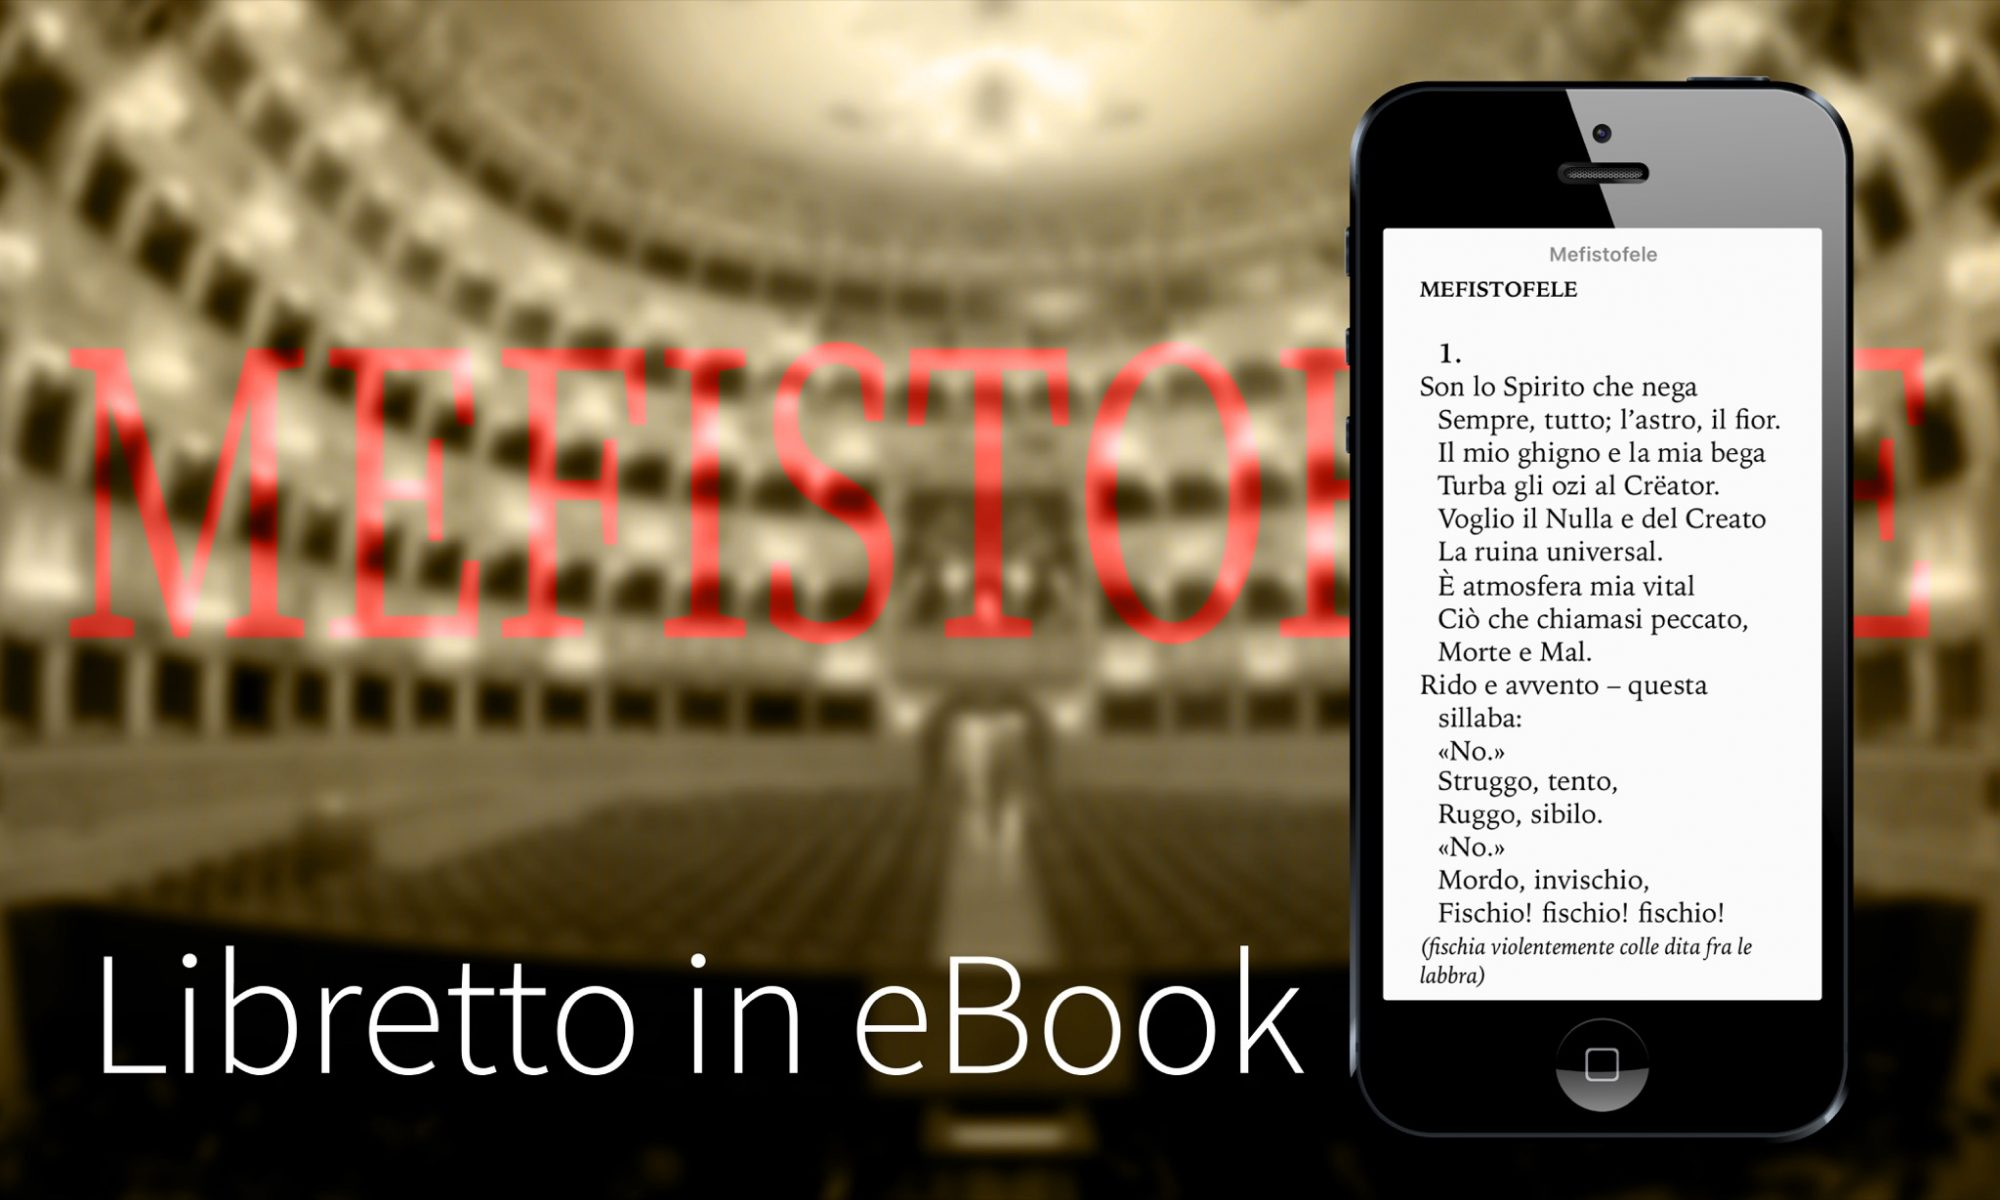 Libretto Mefistofele - Arrigo Boito